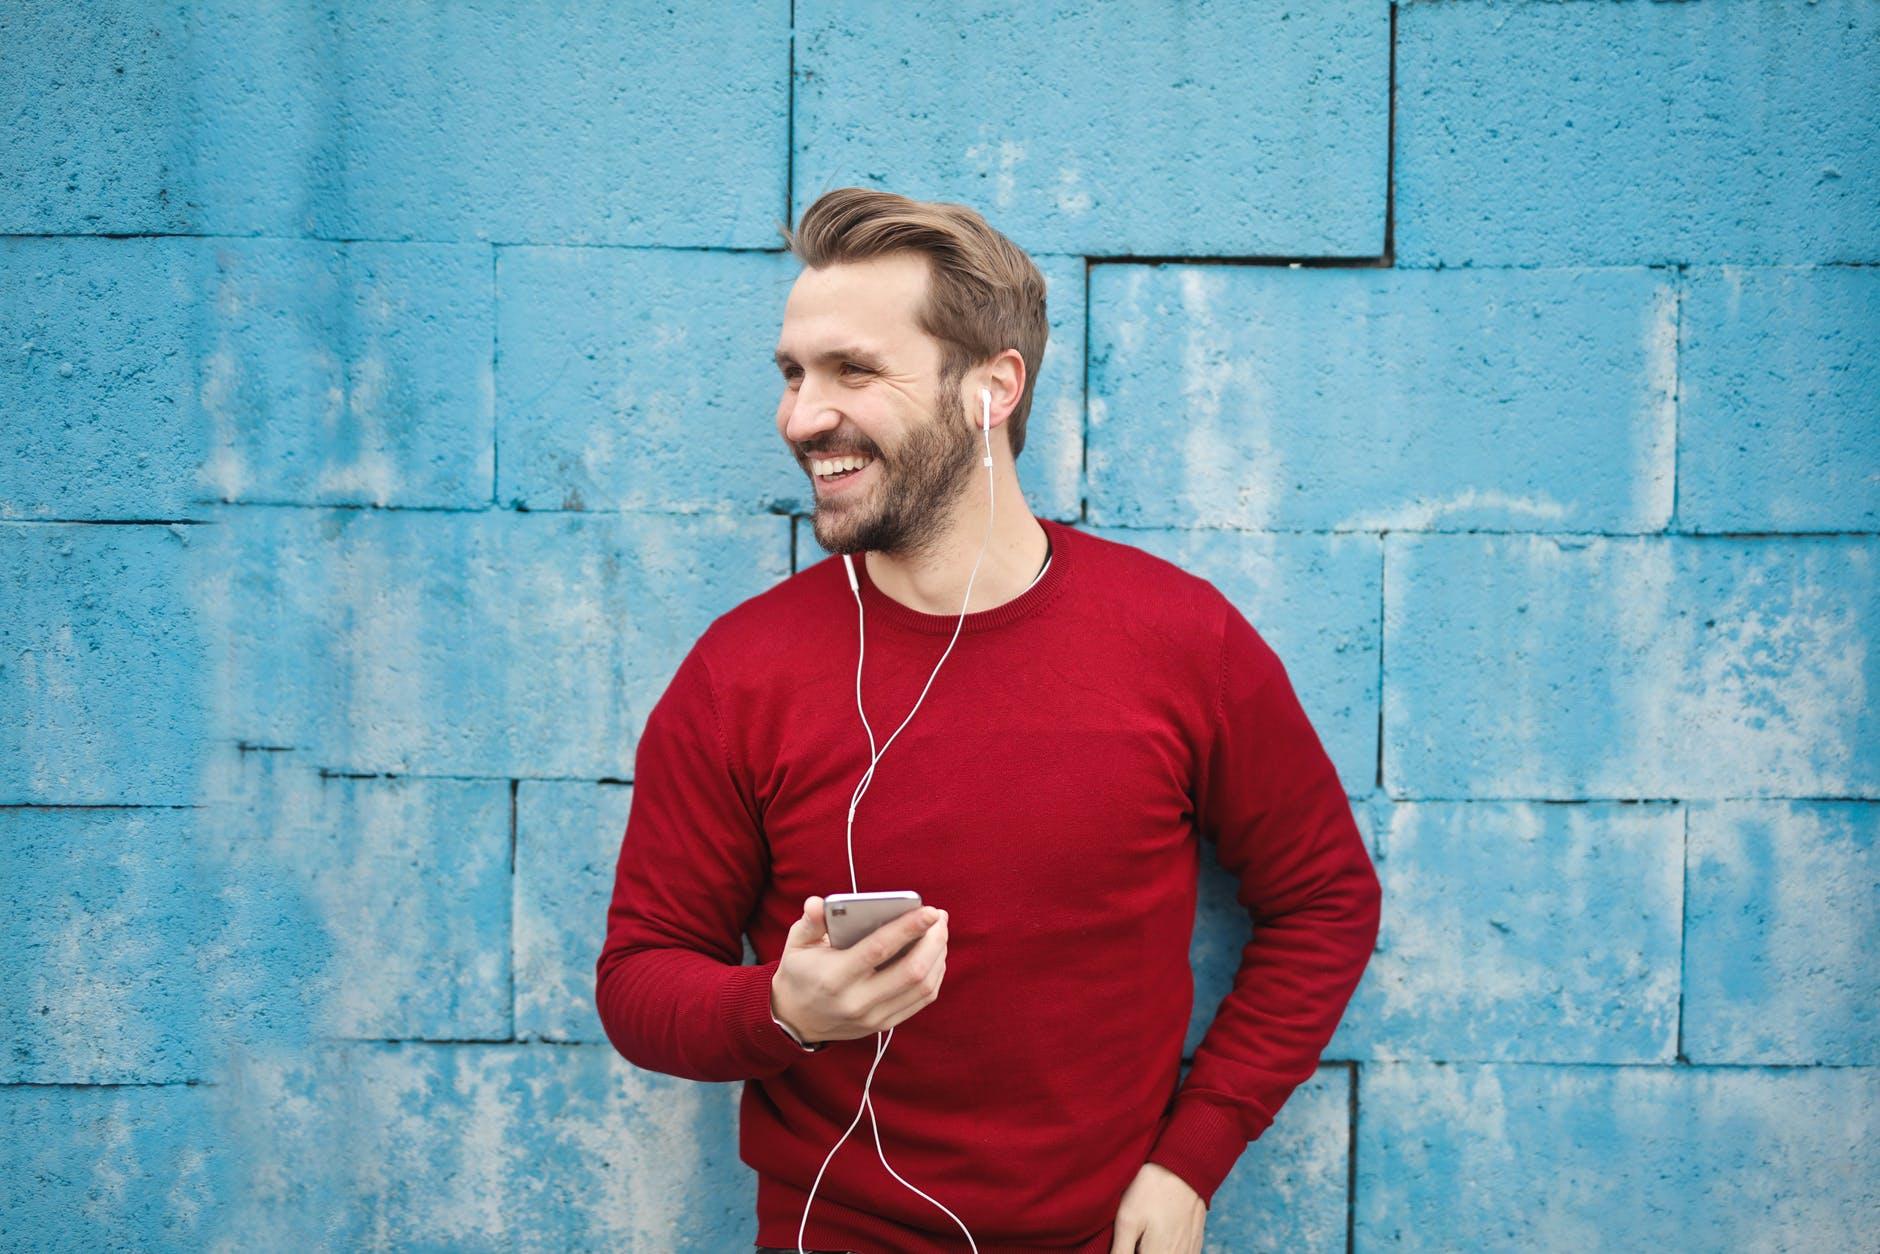 Männer wünschen sich oft weniger Bauch